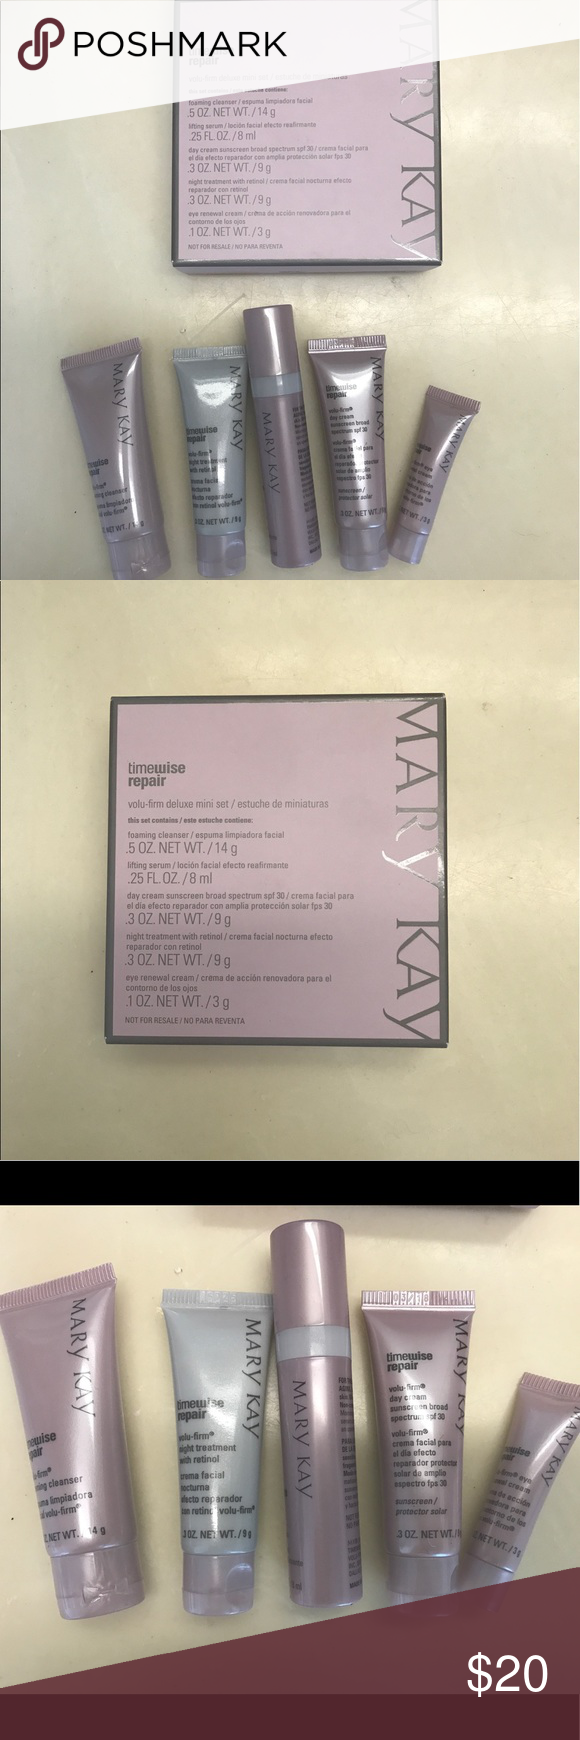 Mary Kay Timewise Repair Deluxe Set 5 items of Facewash, Serum, eye cream, night treatment with retinol, day cream with sunblock Sephora Makeup